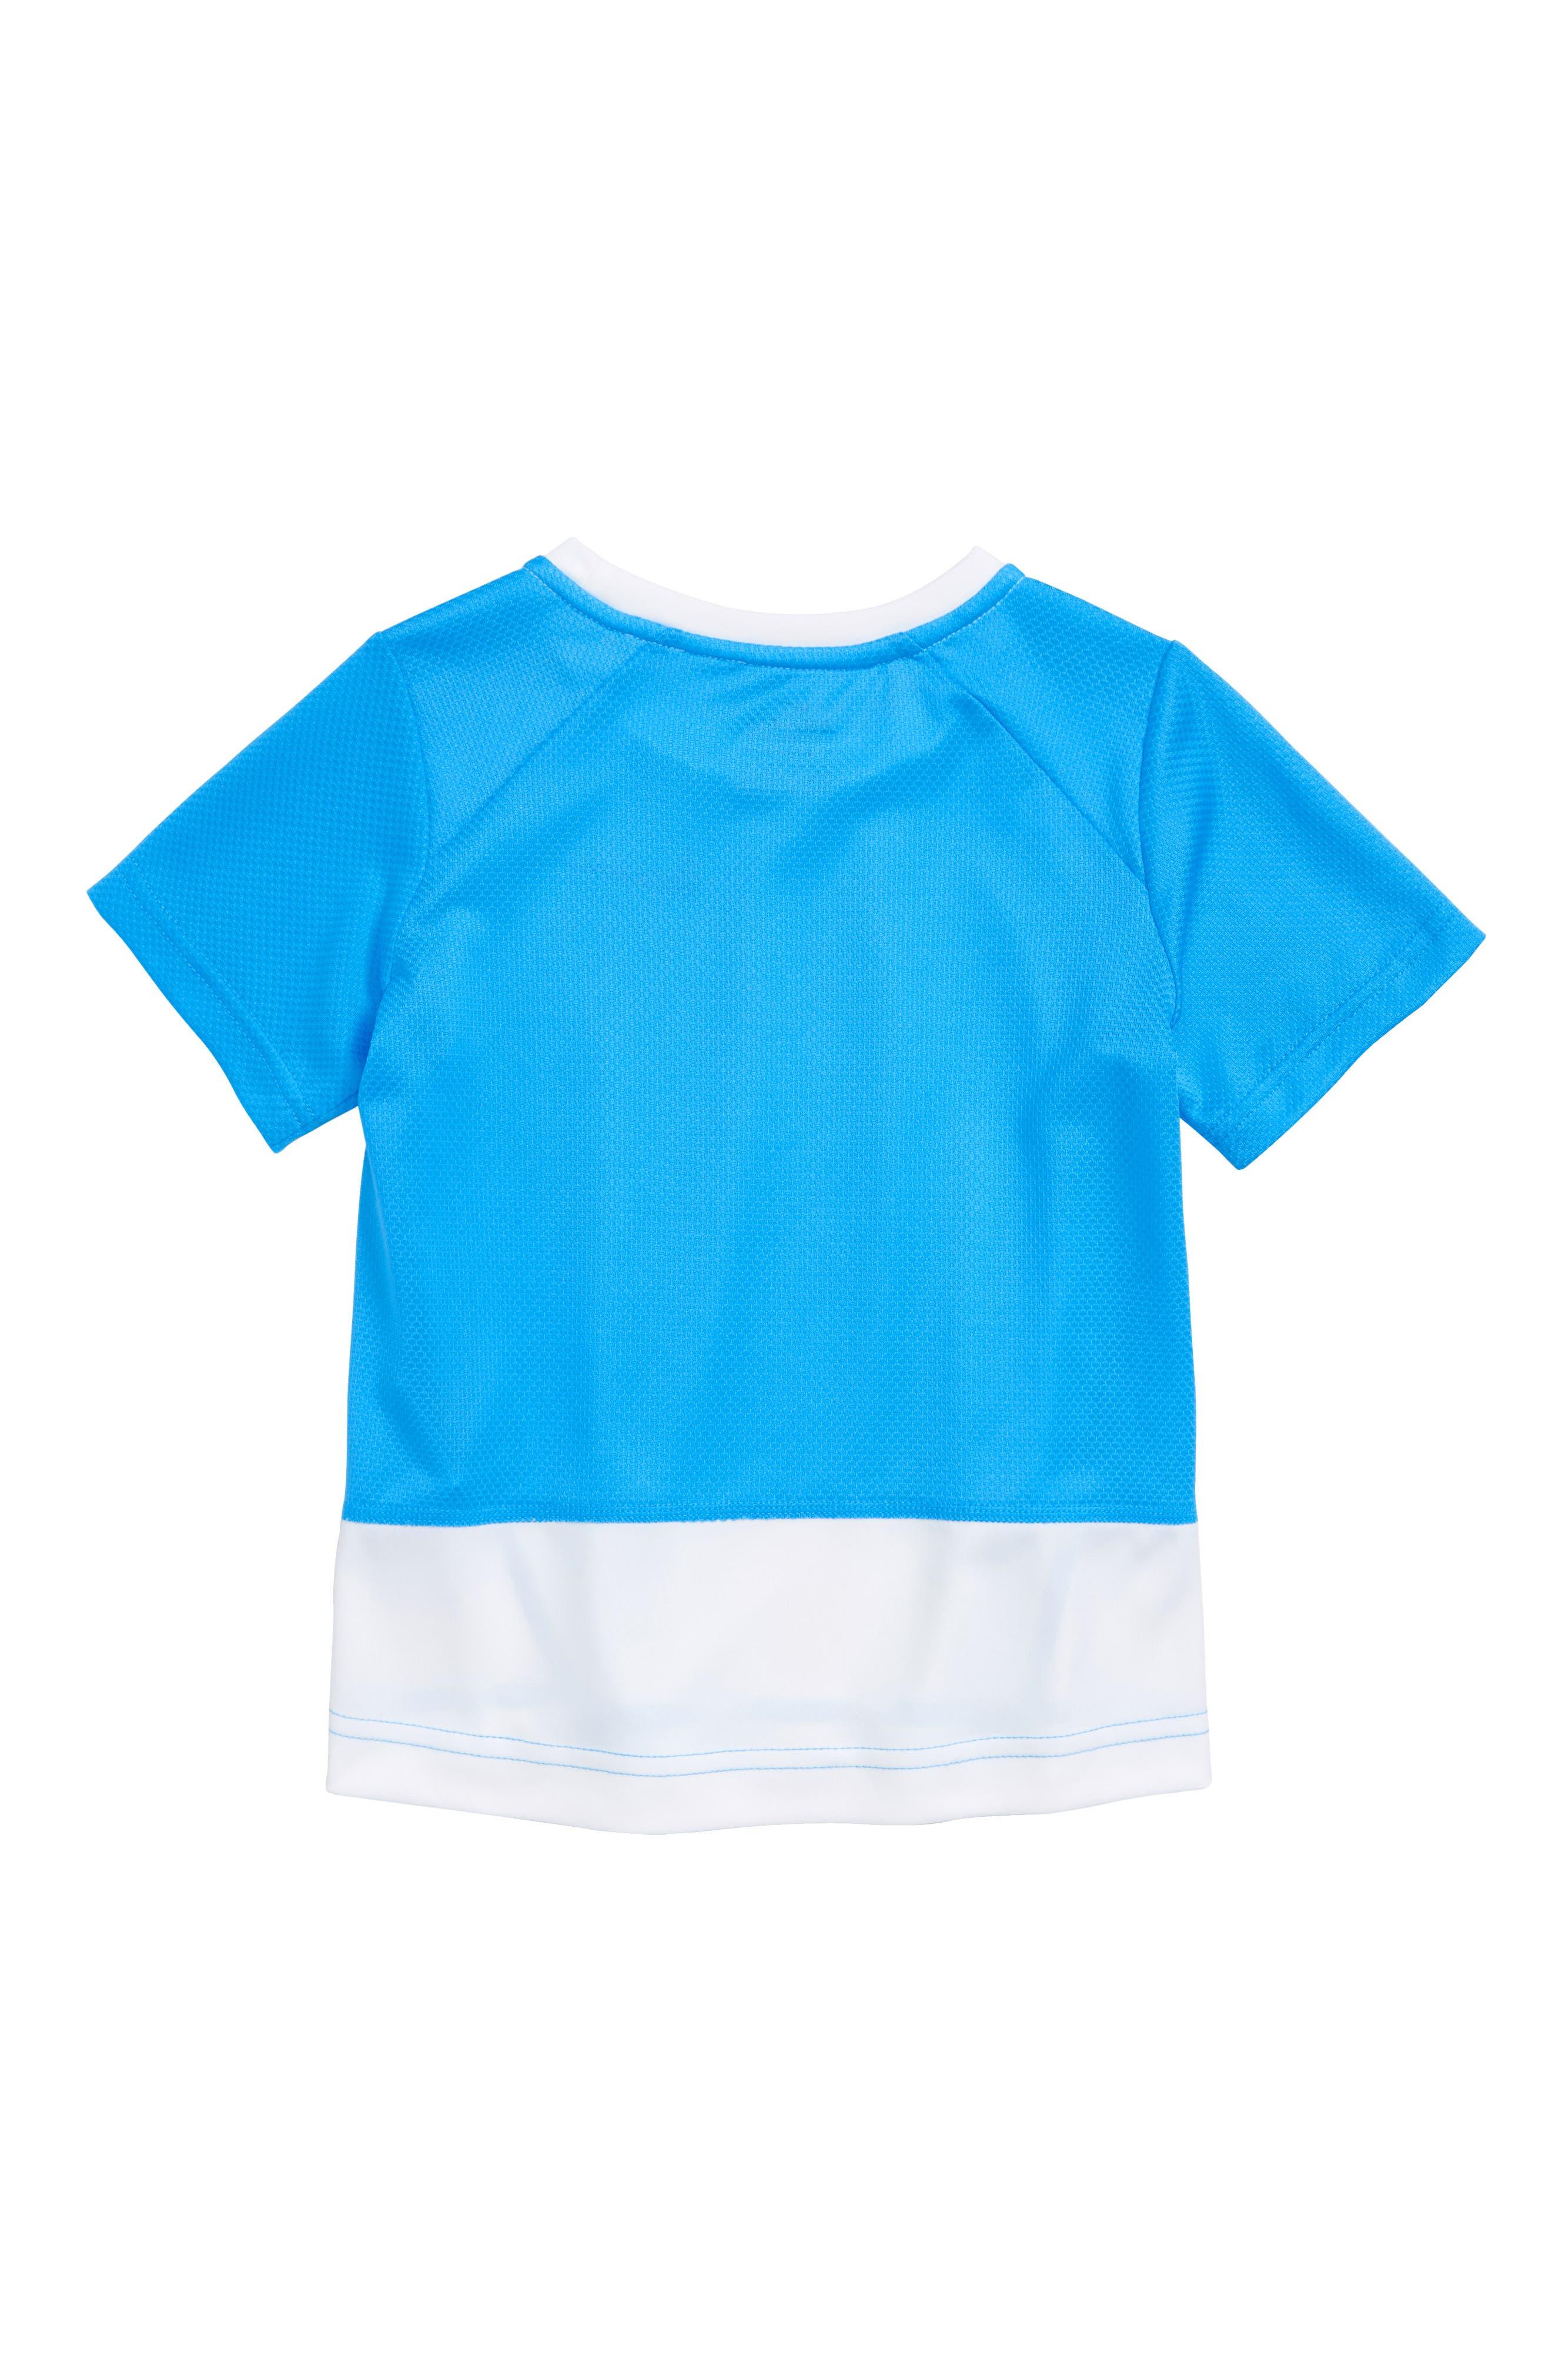 Dry INSTACOOL Shirt,                             Alternate thumbnail 5, color,